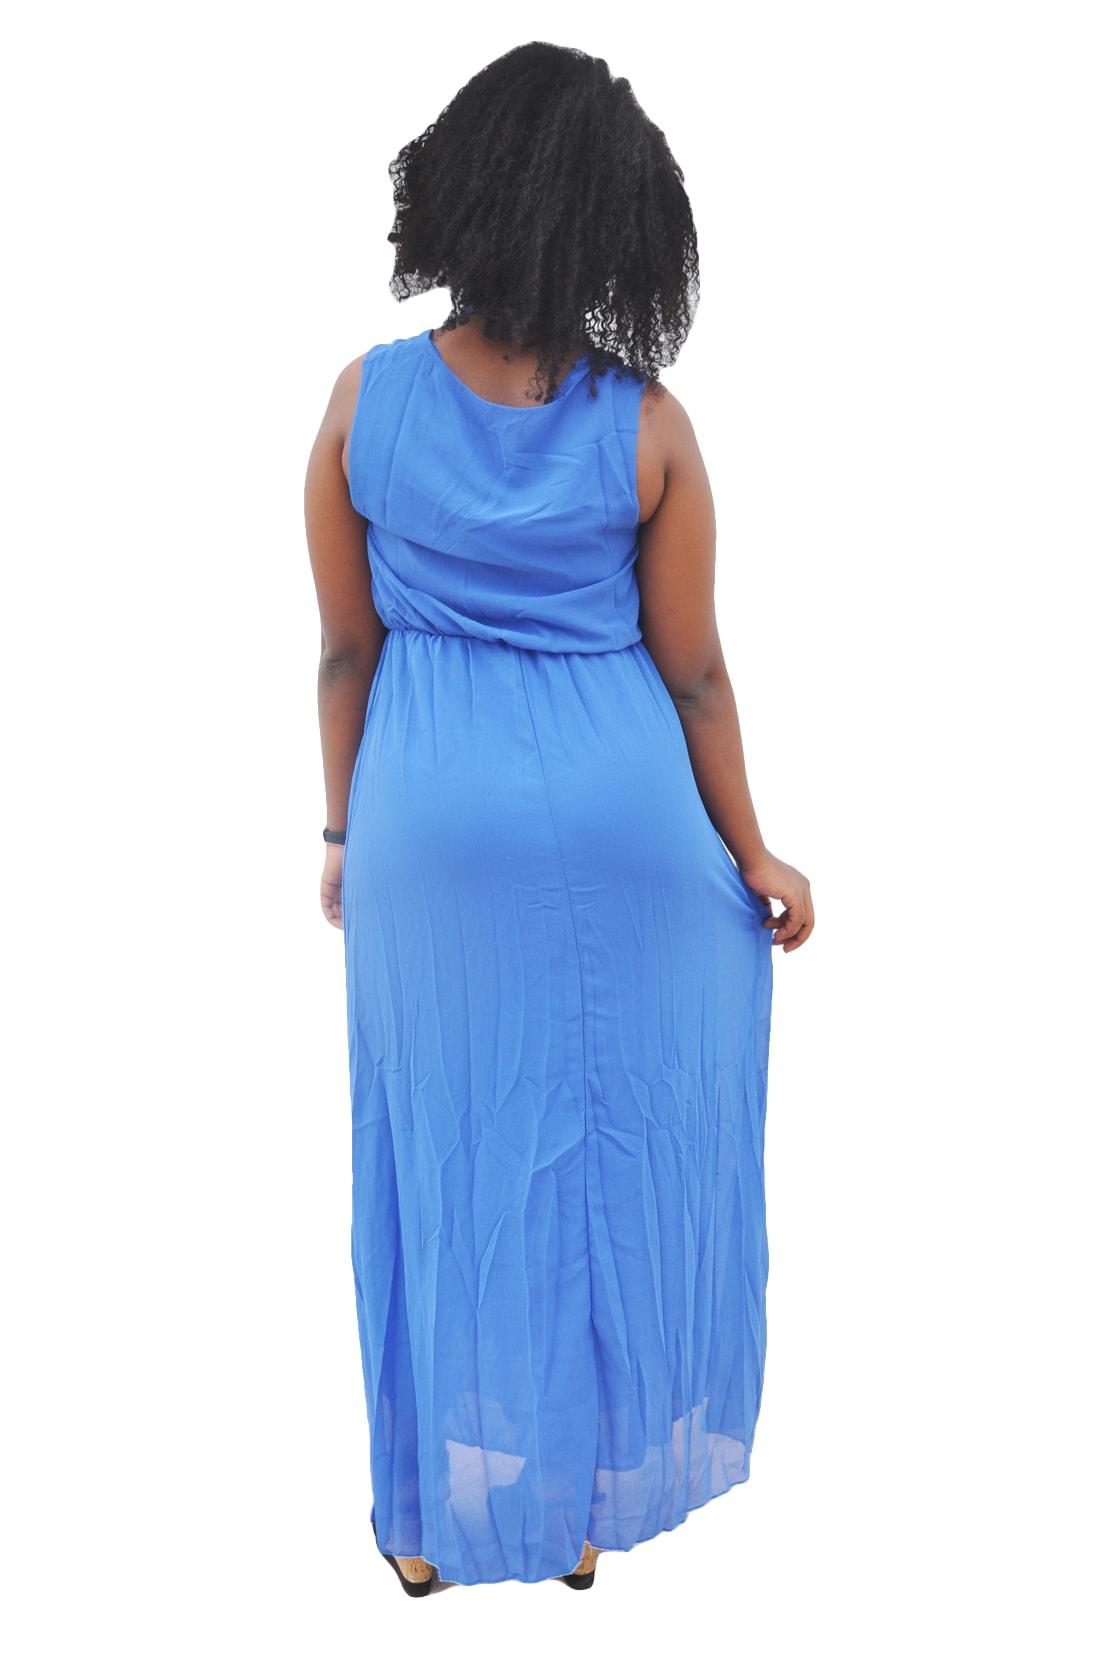 M0297 blue3 Bohemian Dresses maureens.com boutique